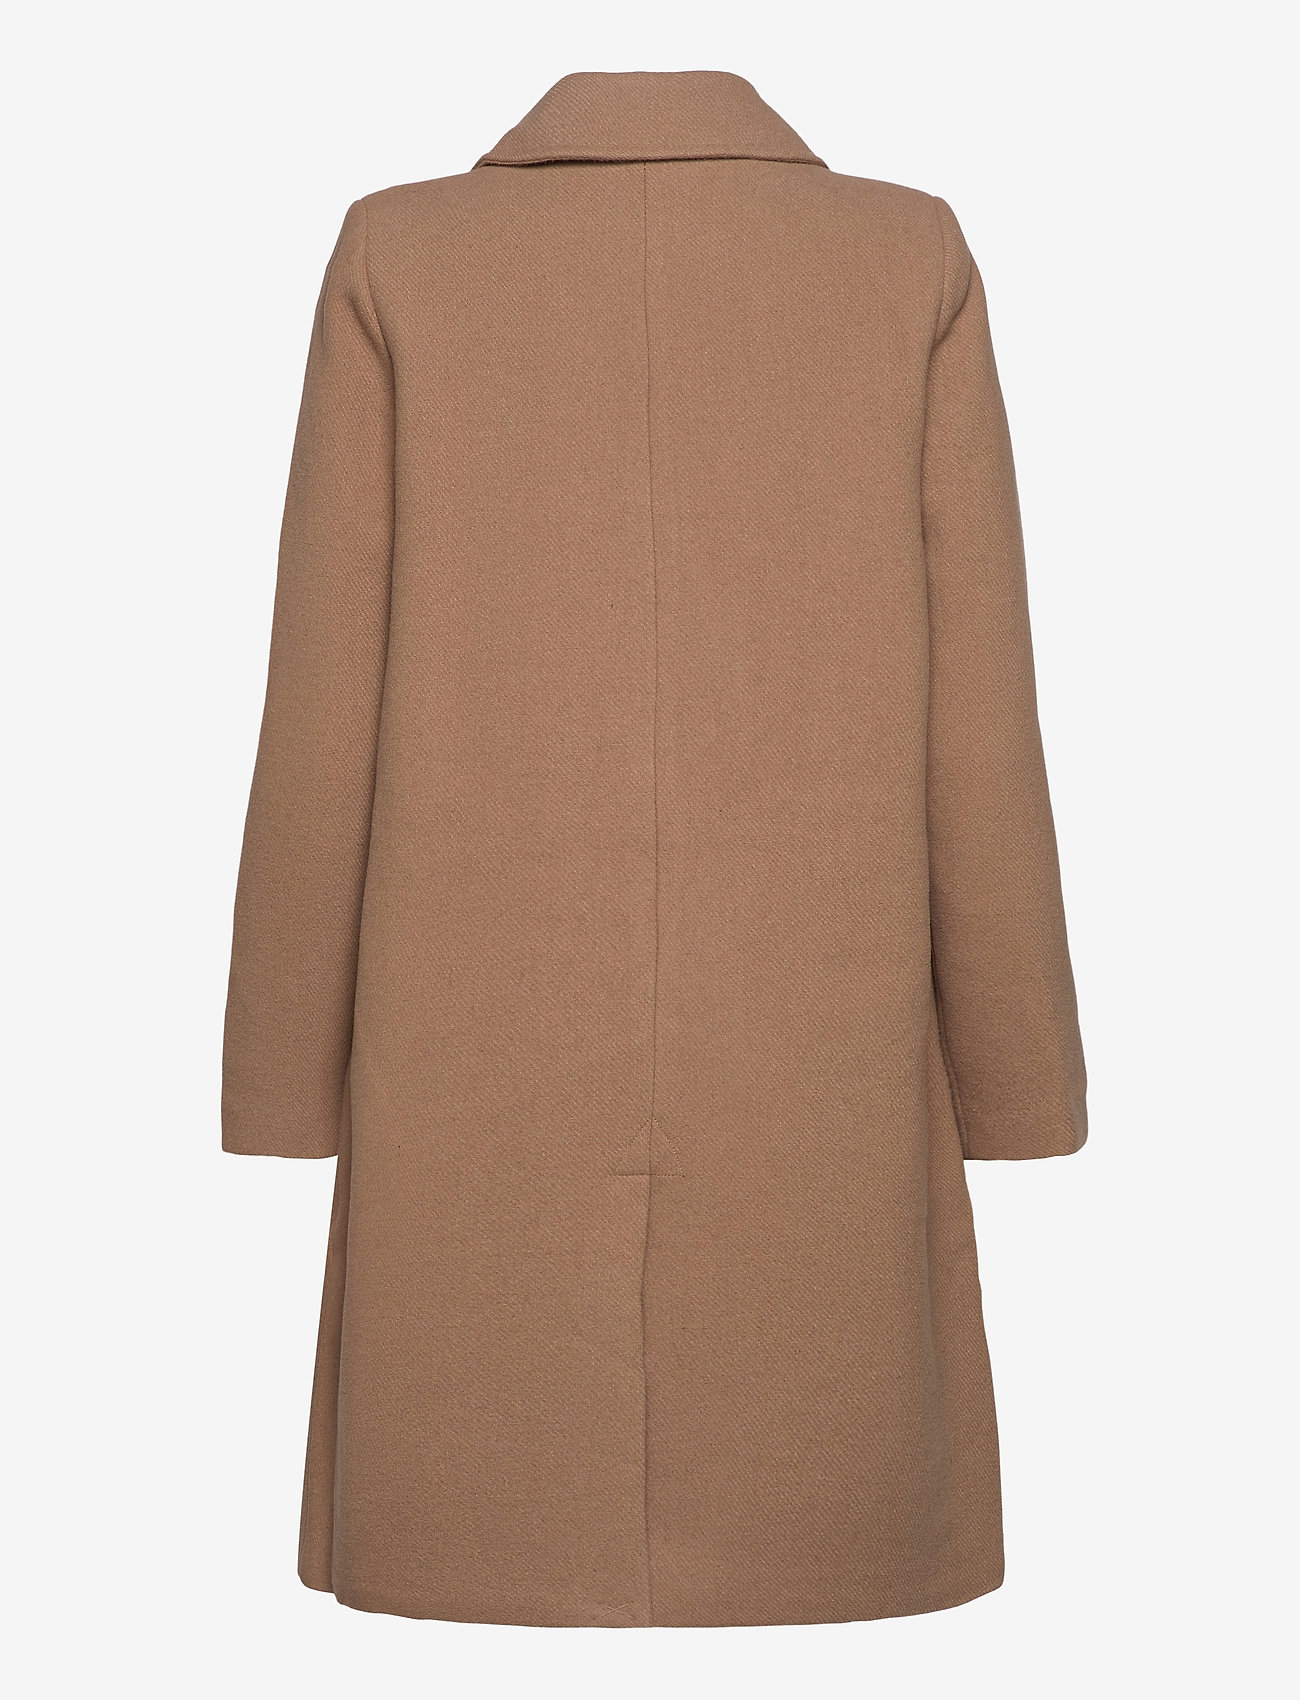 Selected Femme - SLFSASSY WOOL COAT B - wool coats - tigers eye - 1